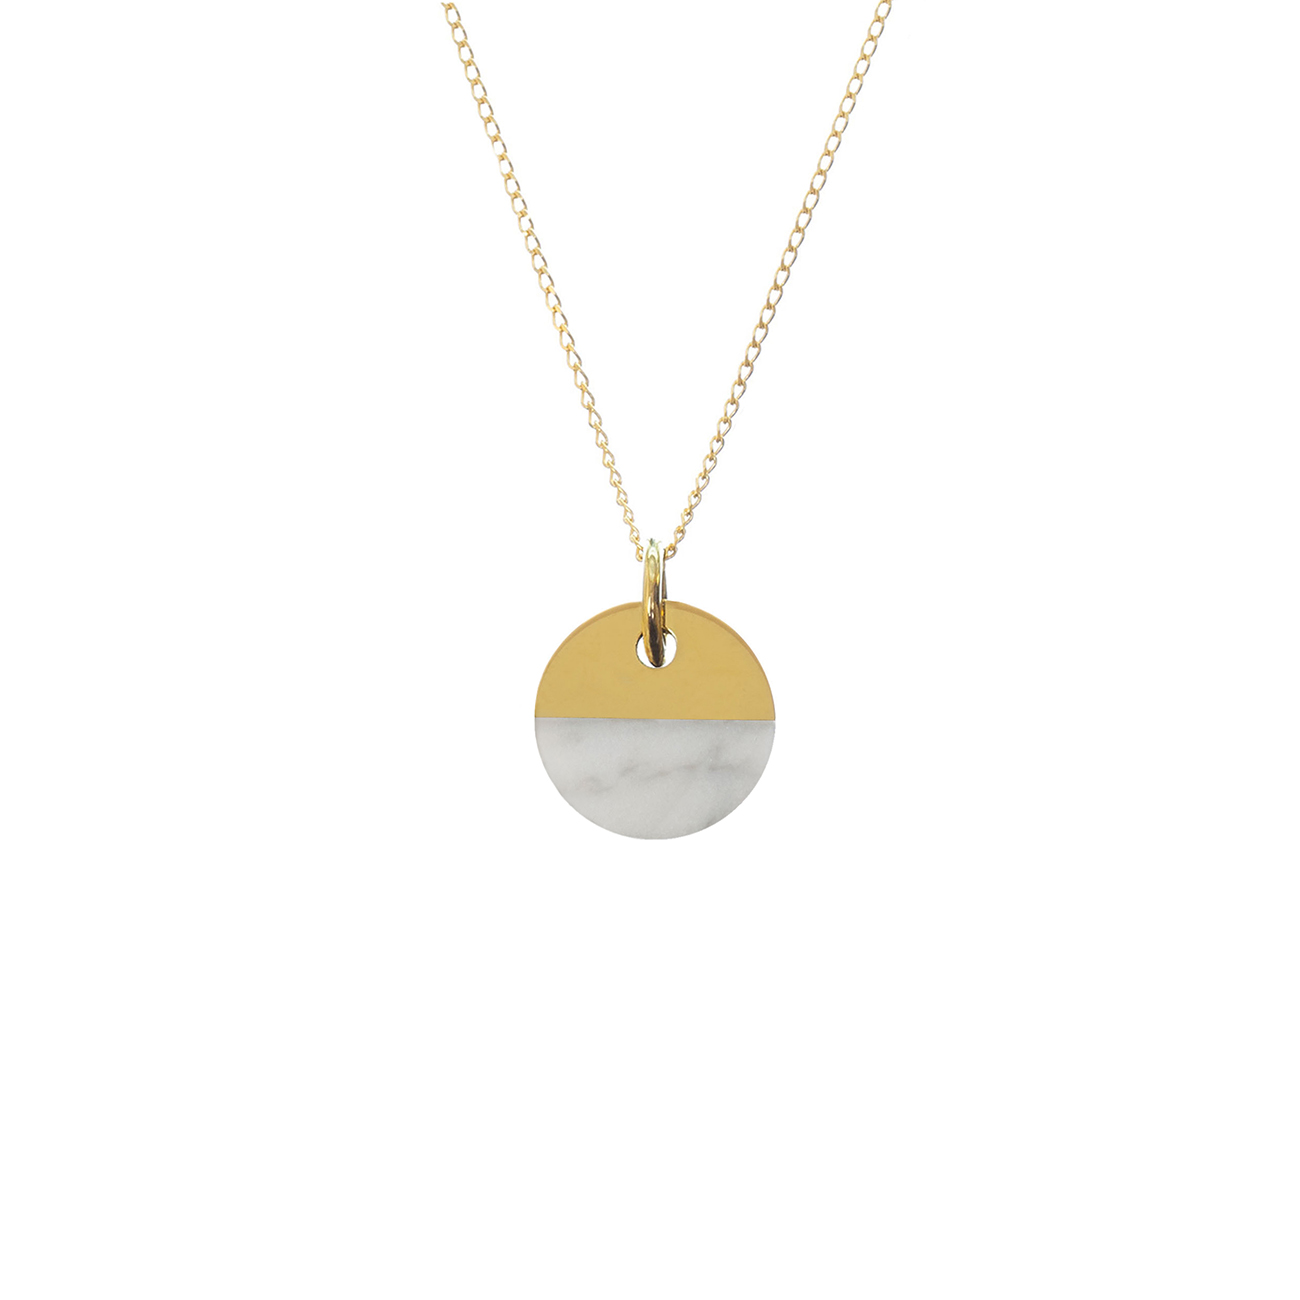 metaformi_design_jewelry_split_round_necklace_bianco